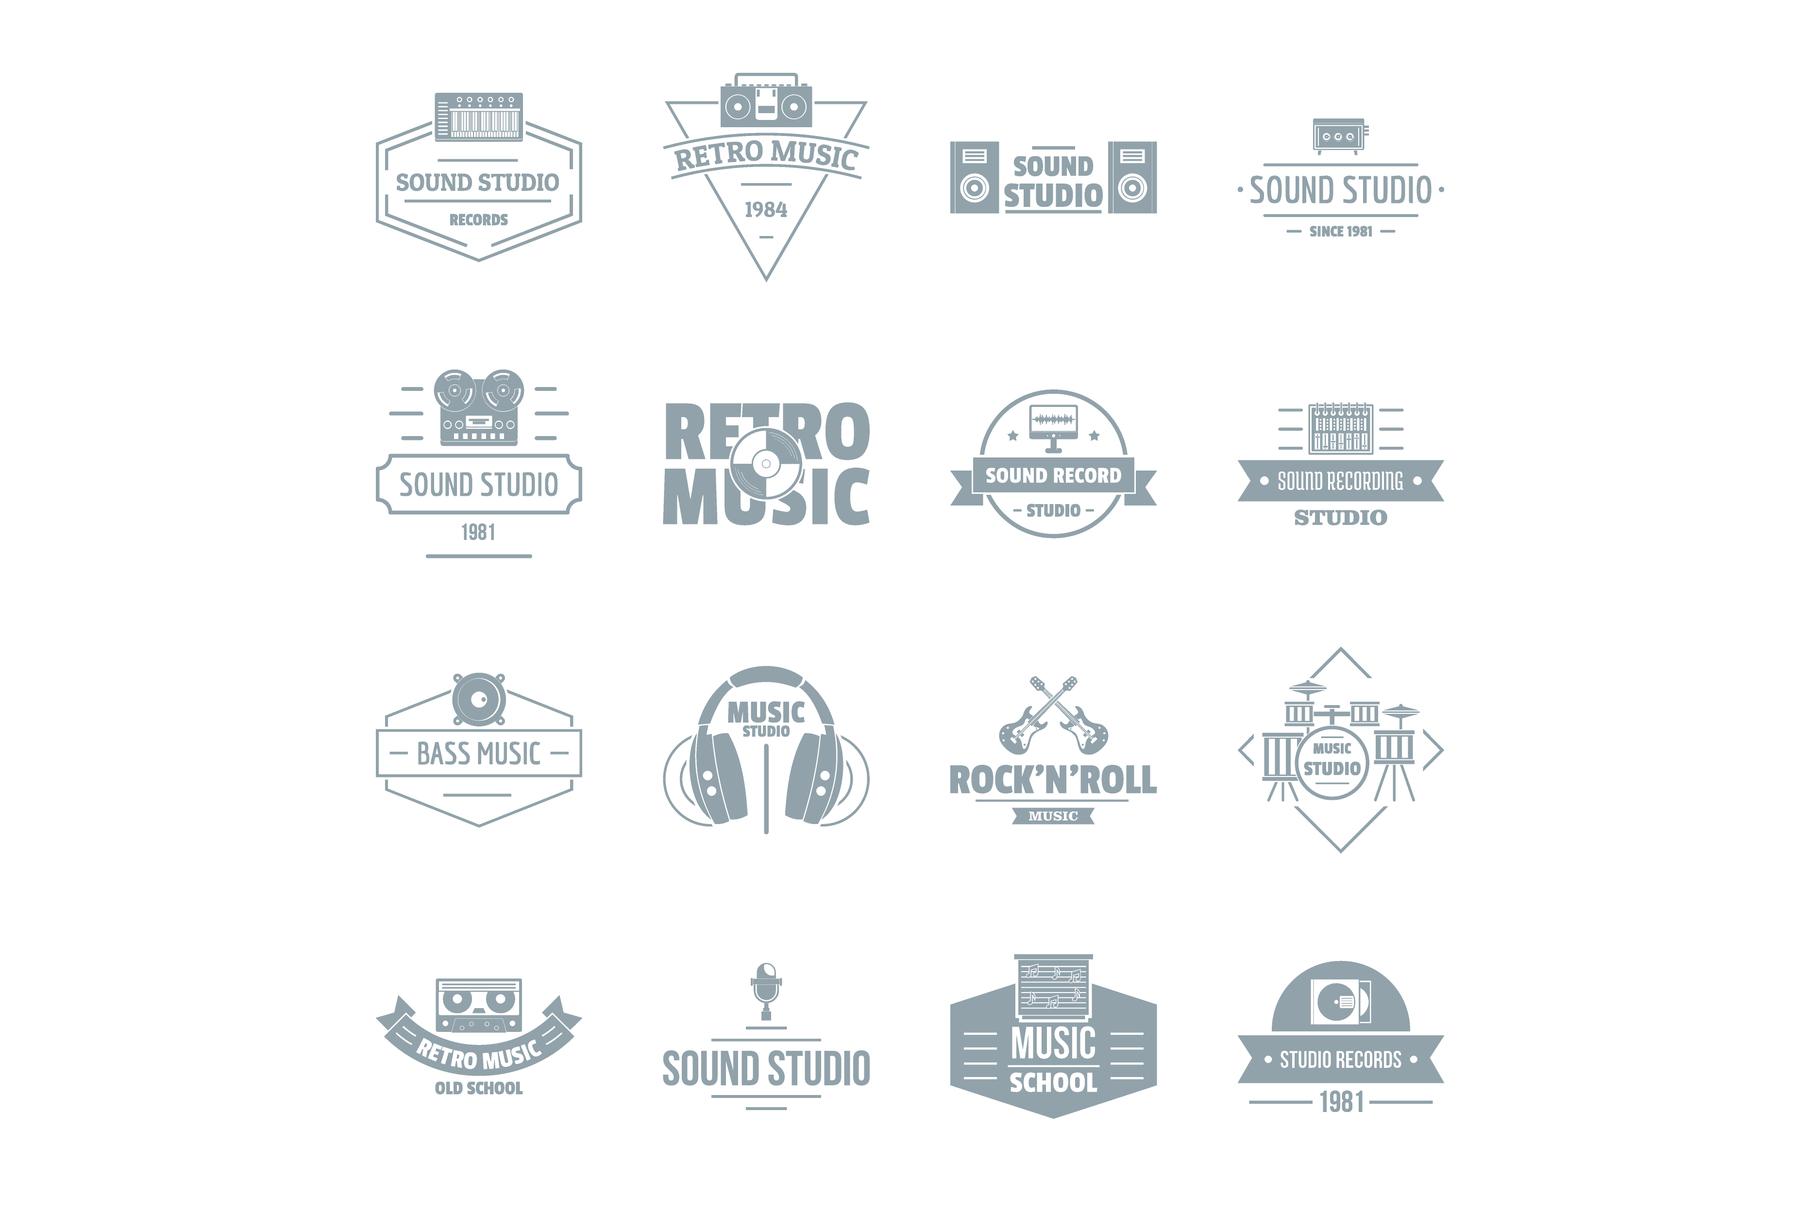 Music studio logo icons set, simple style.